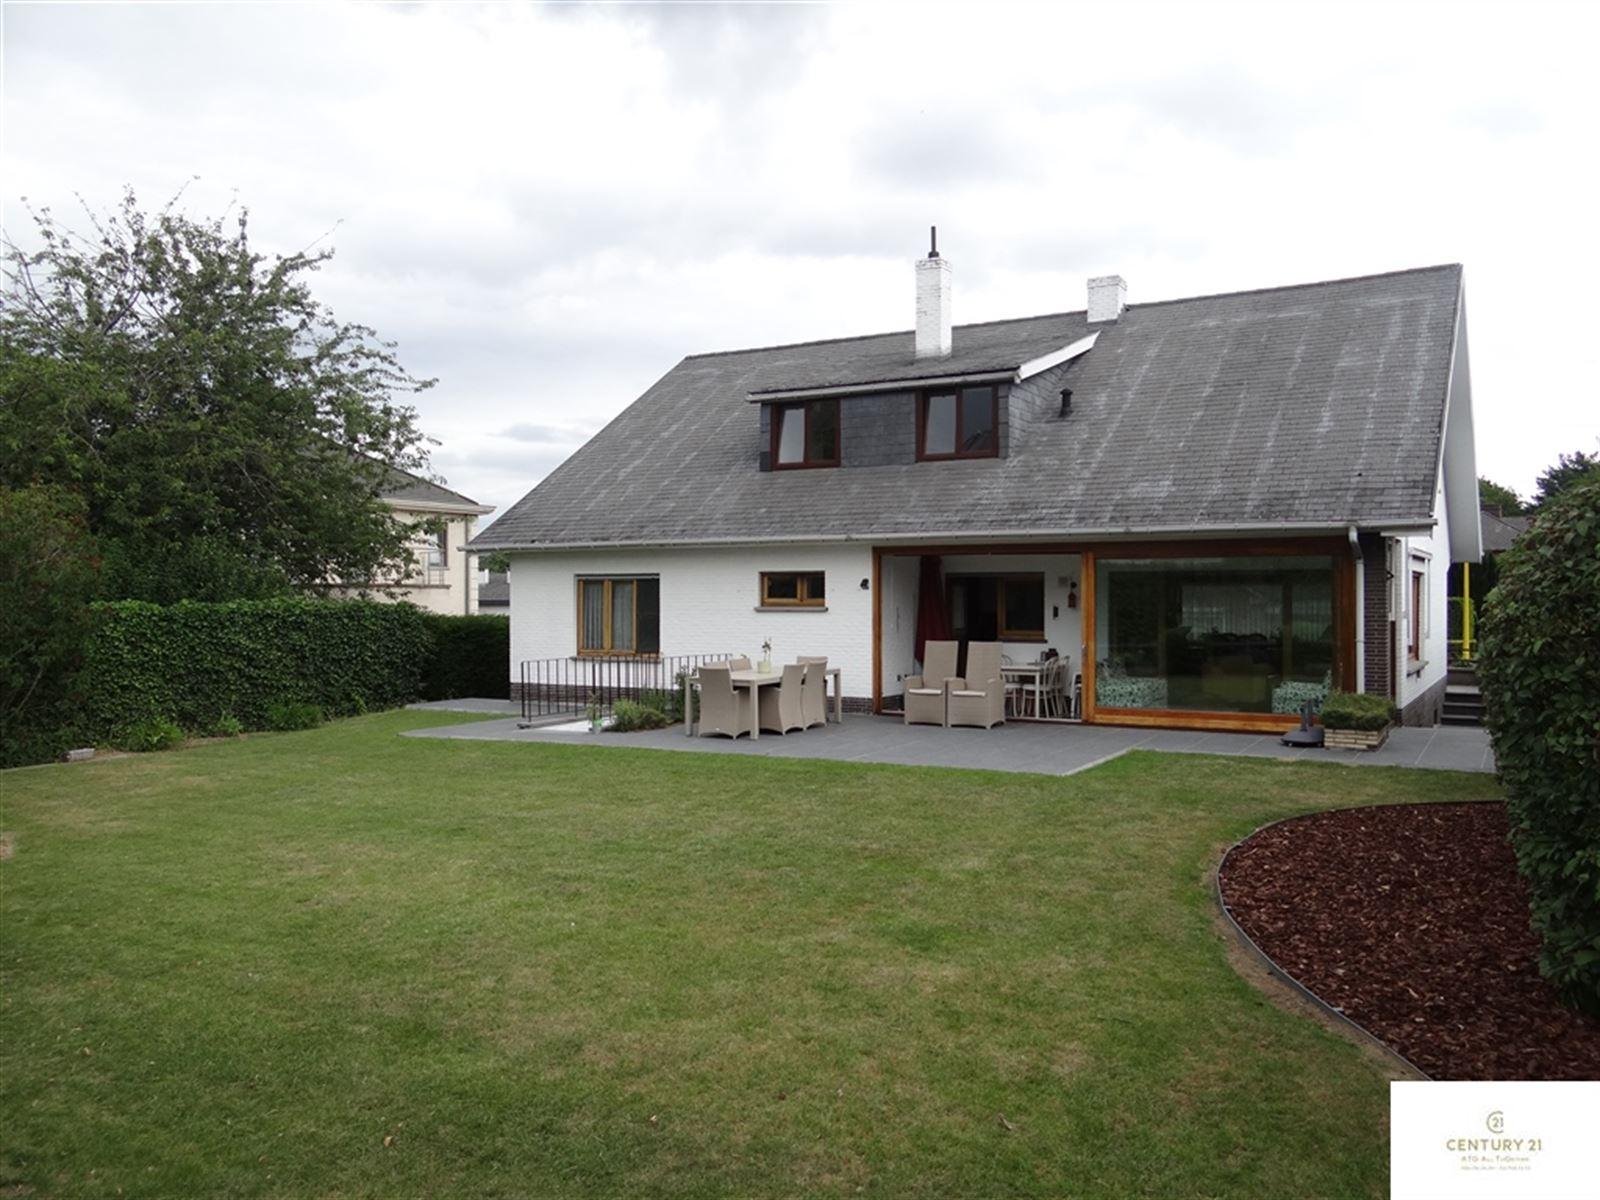 Villa – 1850 Grimbergen